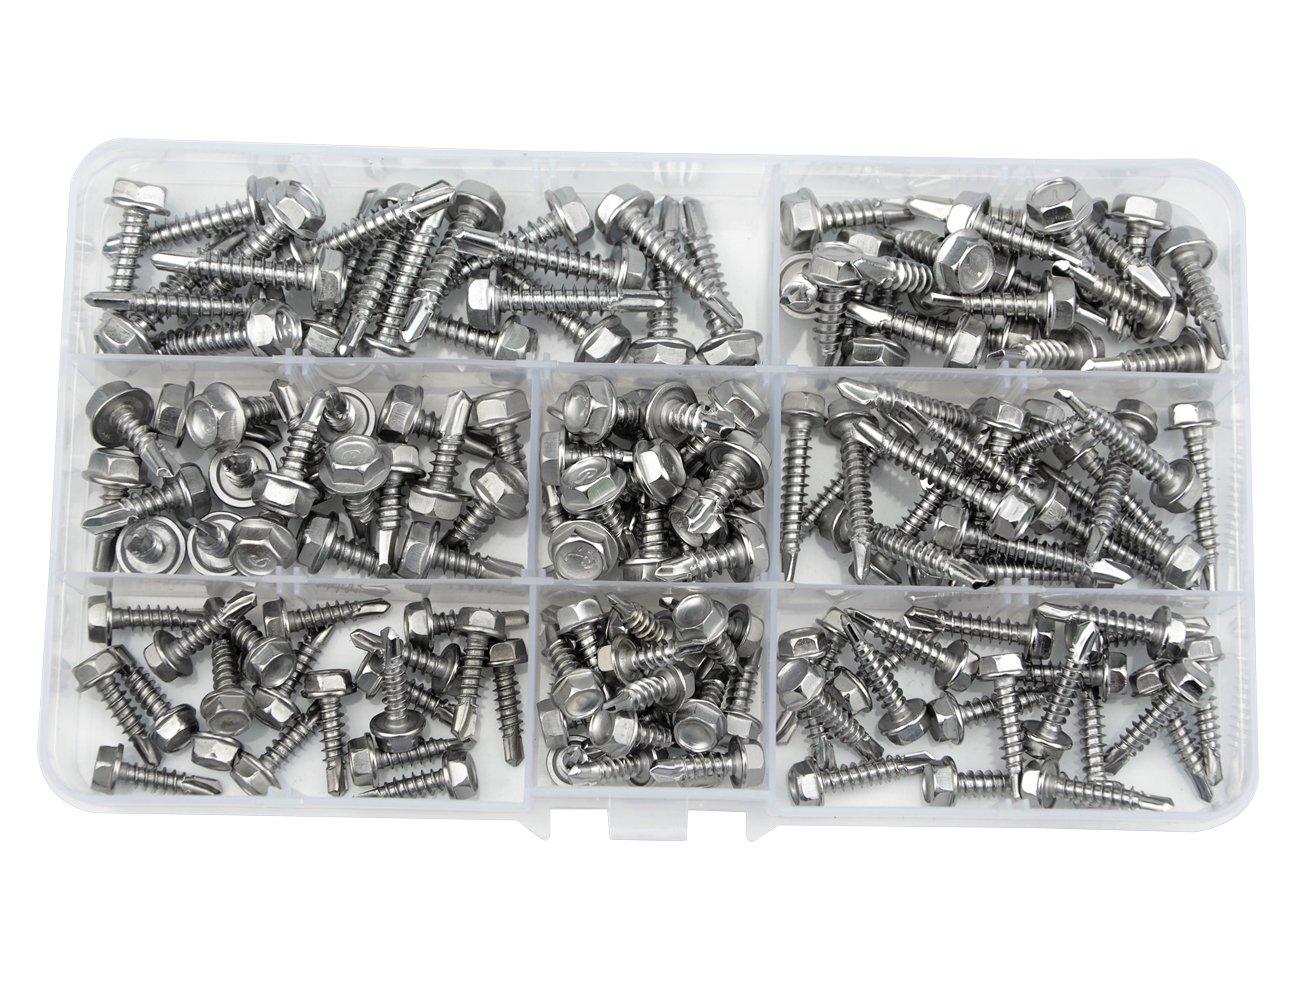 WGCD 240 PCS Stainless Steel #8#10 Hex Washer Head Self Drilling Sheet Metal Tek Screws Assorted Kit Hex Head